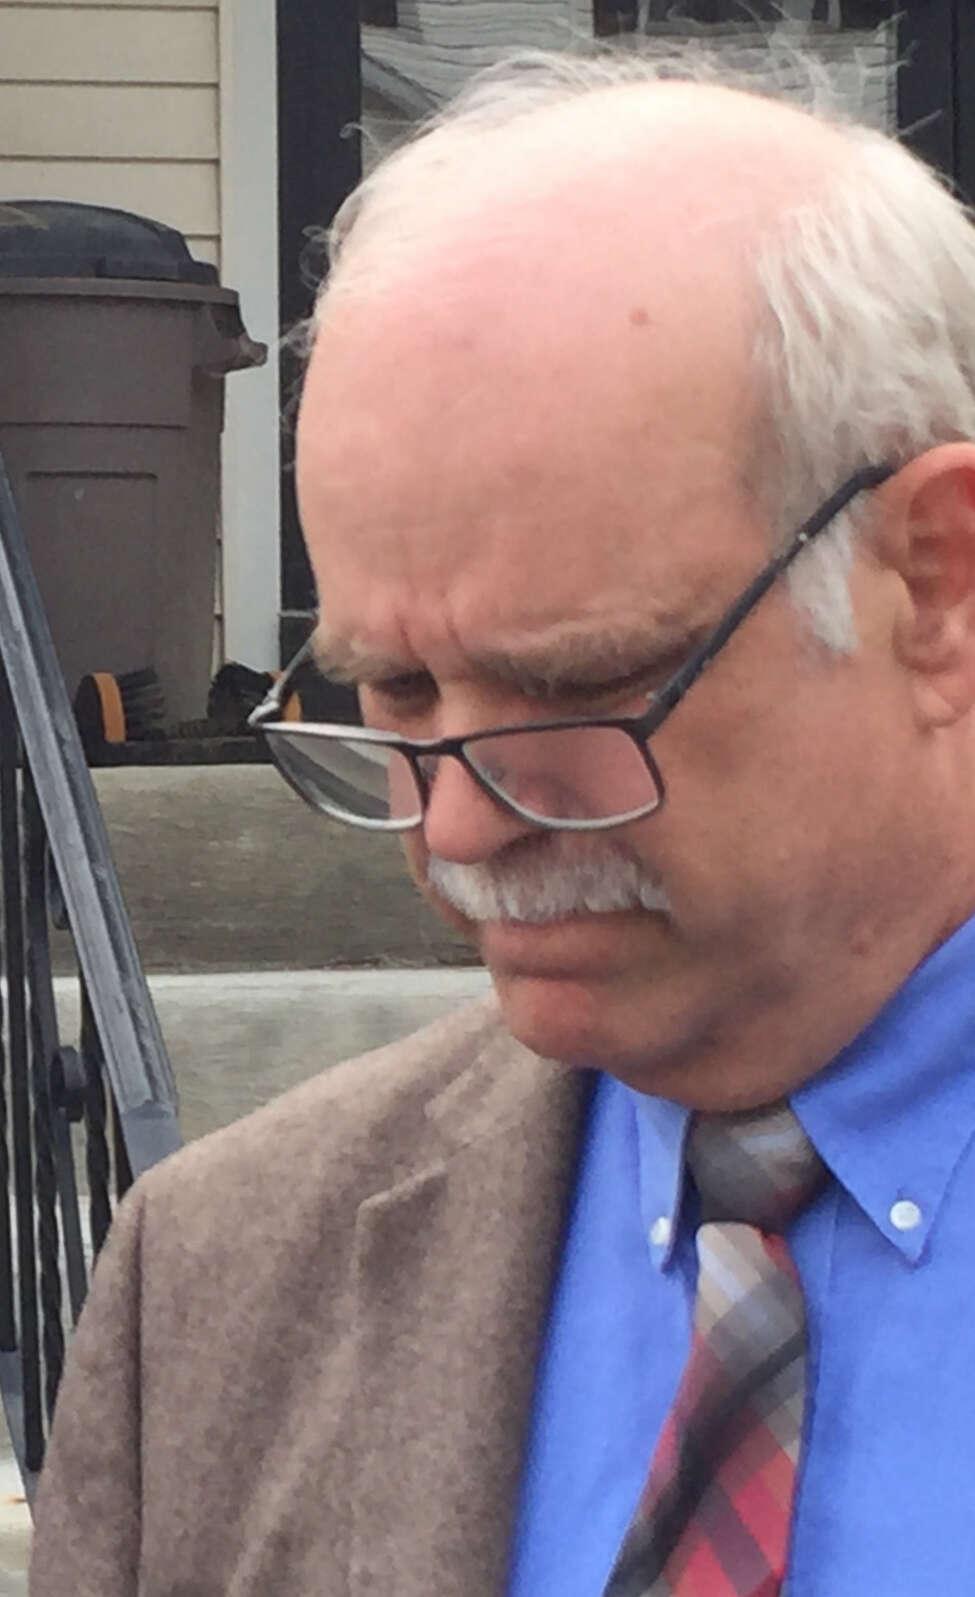 Former state Office of Mental Health official John Allen outside Coeymans Town Court on Thursday, April 18, 2019.